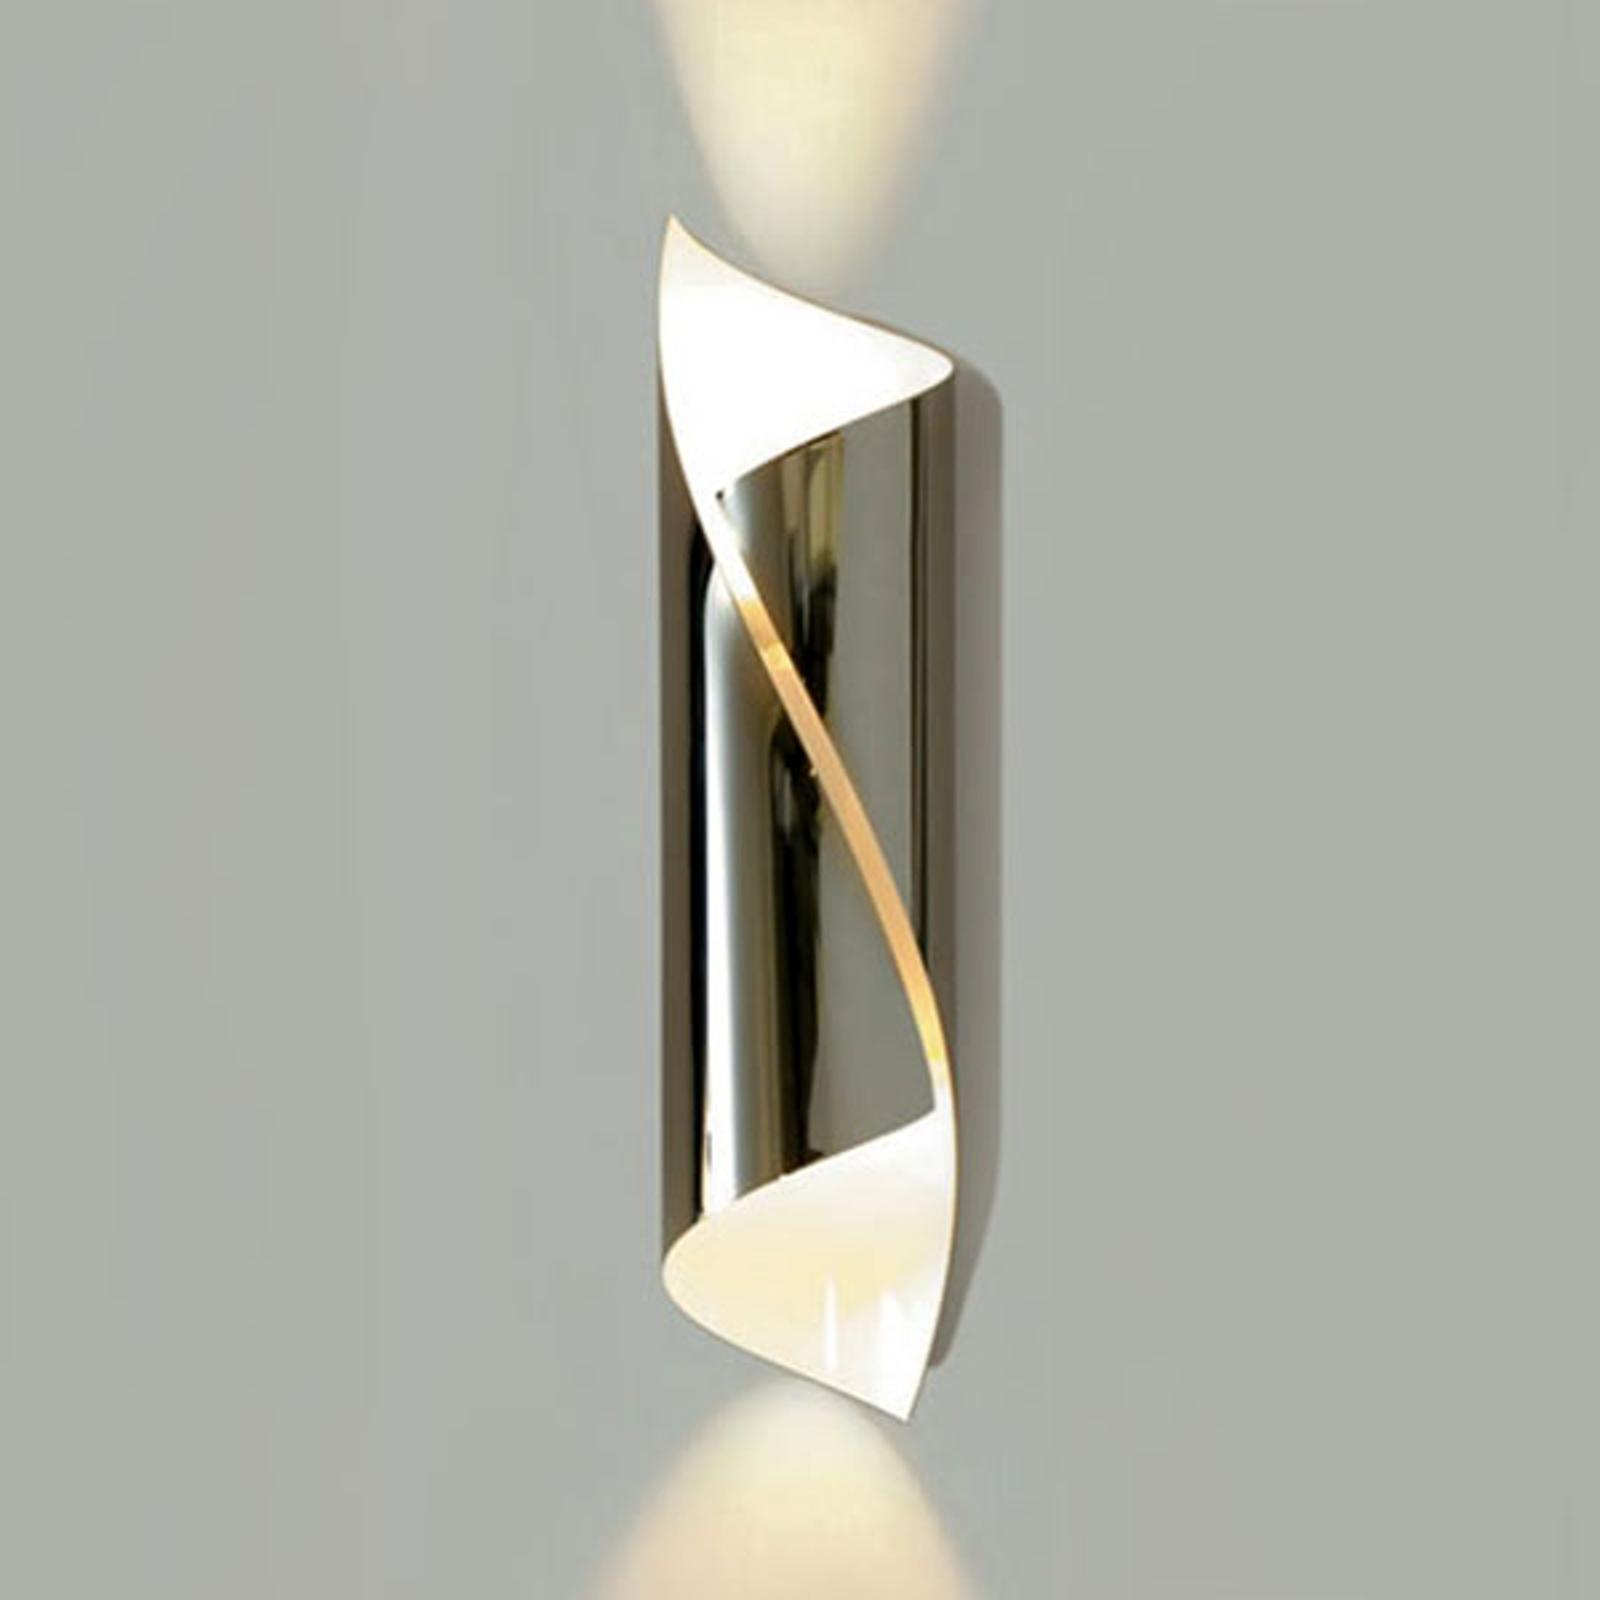 Lśniący designerski kinkiet LED Hué